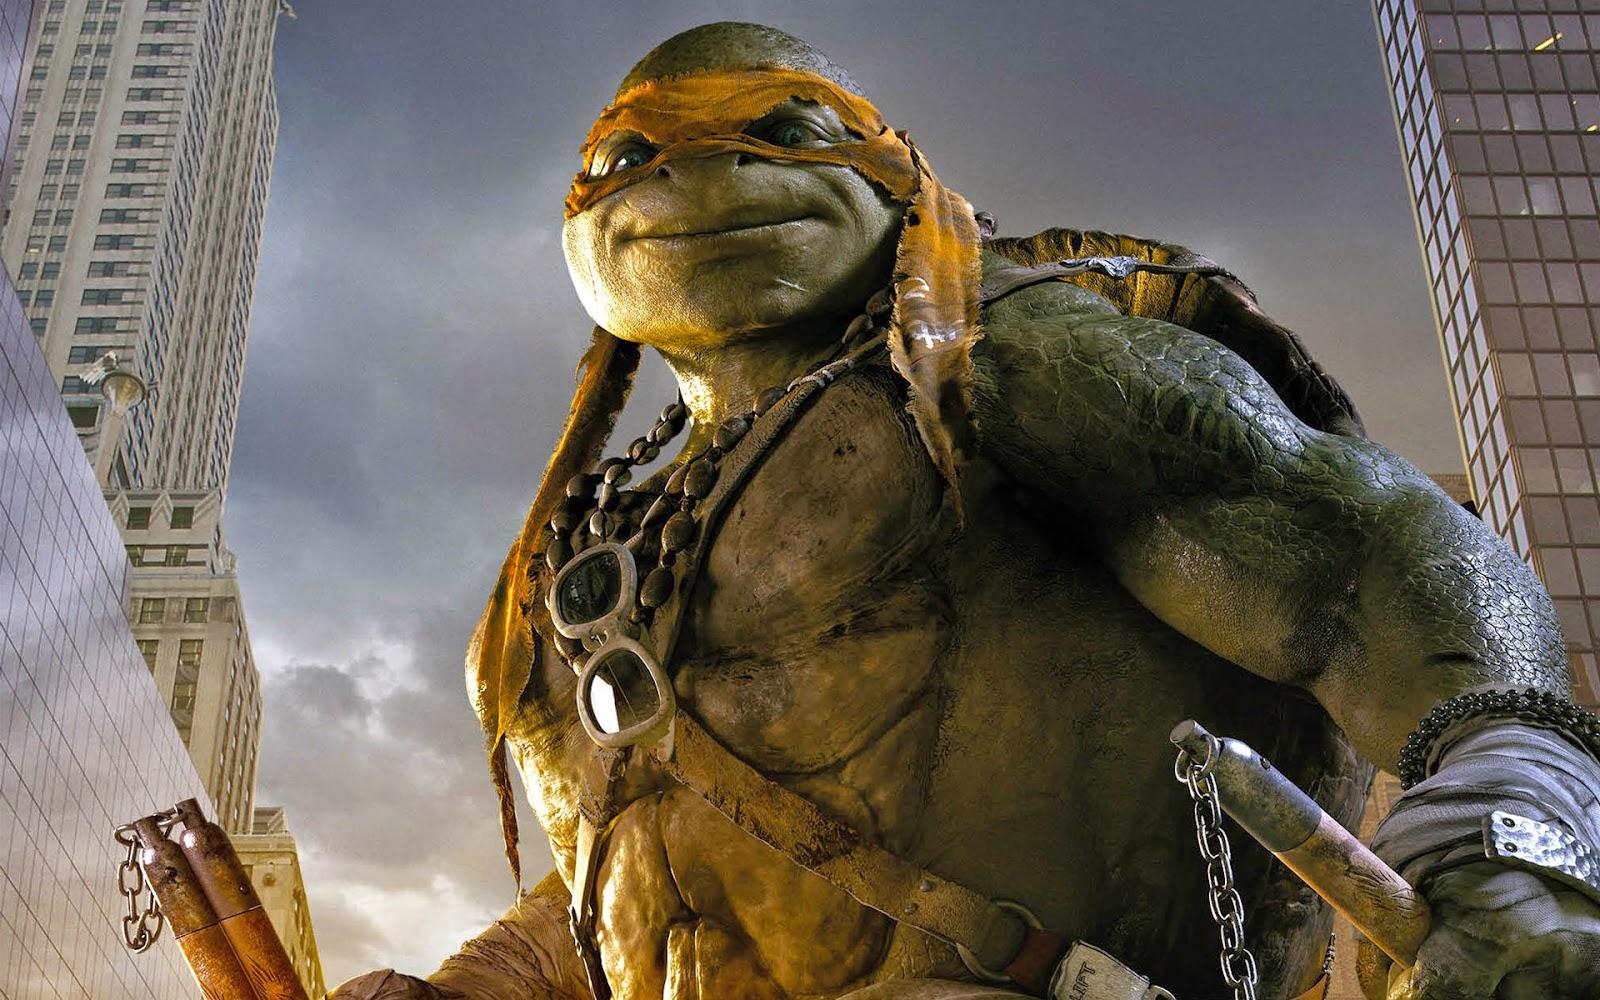 Michelangelo Teenage Mutant Ninja Turtles HD desktop  - mikey in teenage mutant ninja turtles wallpapers